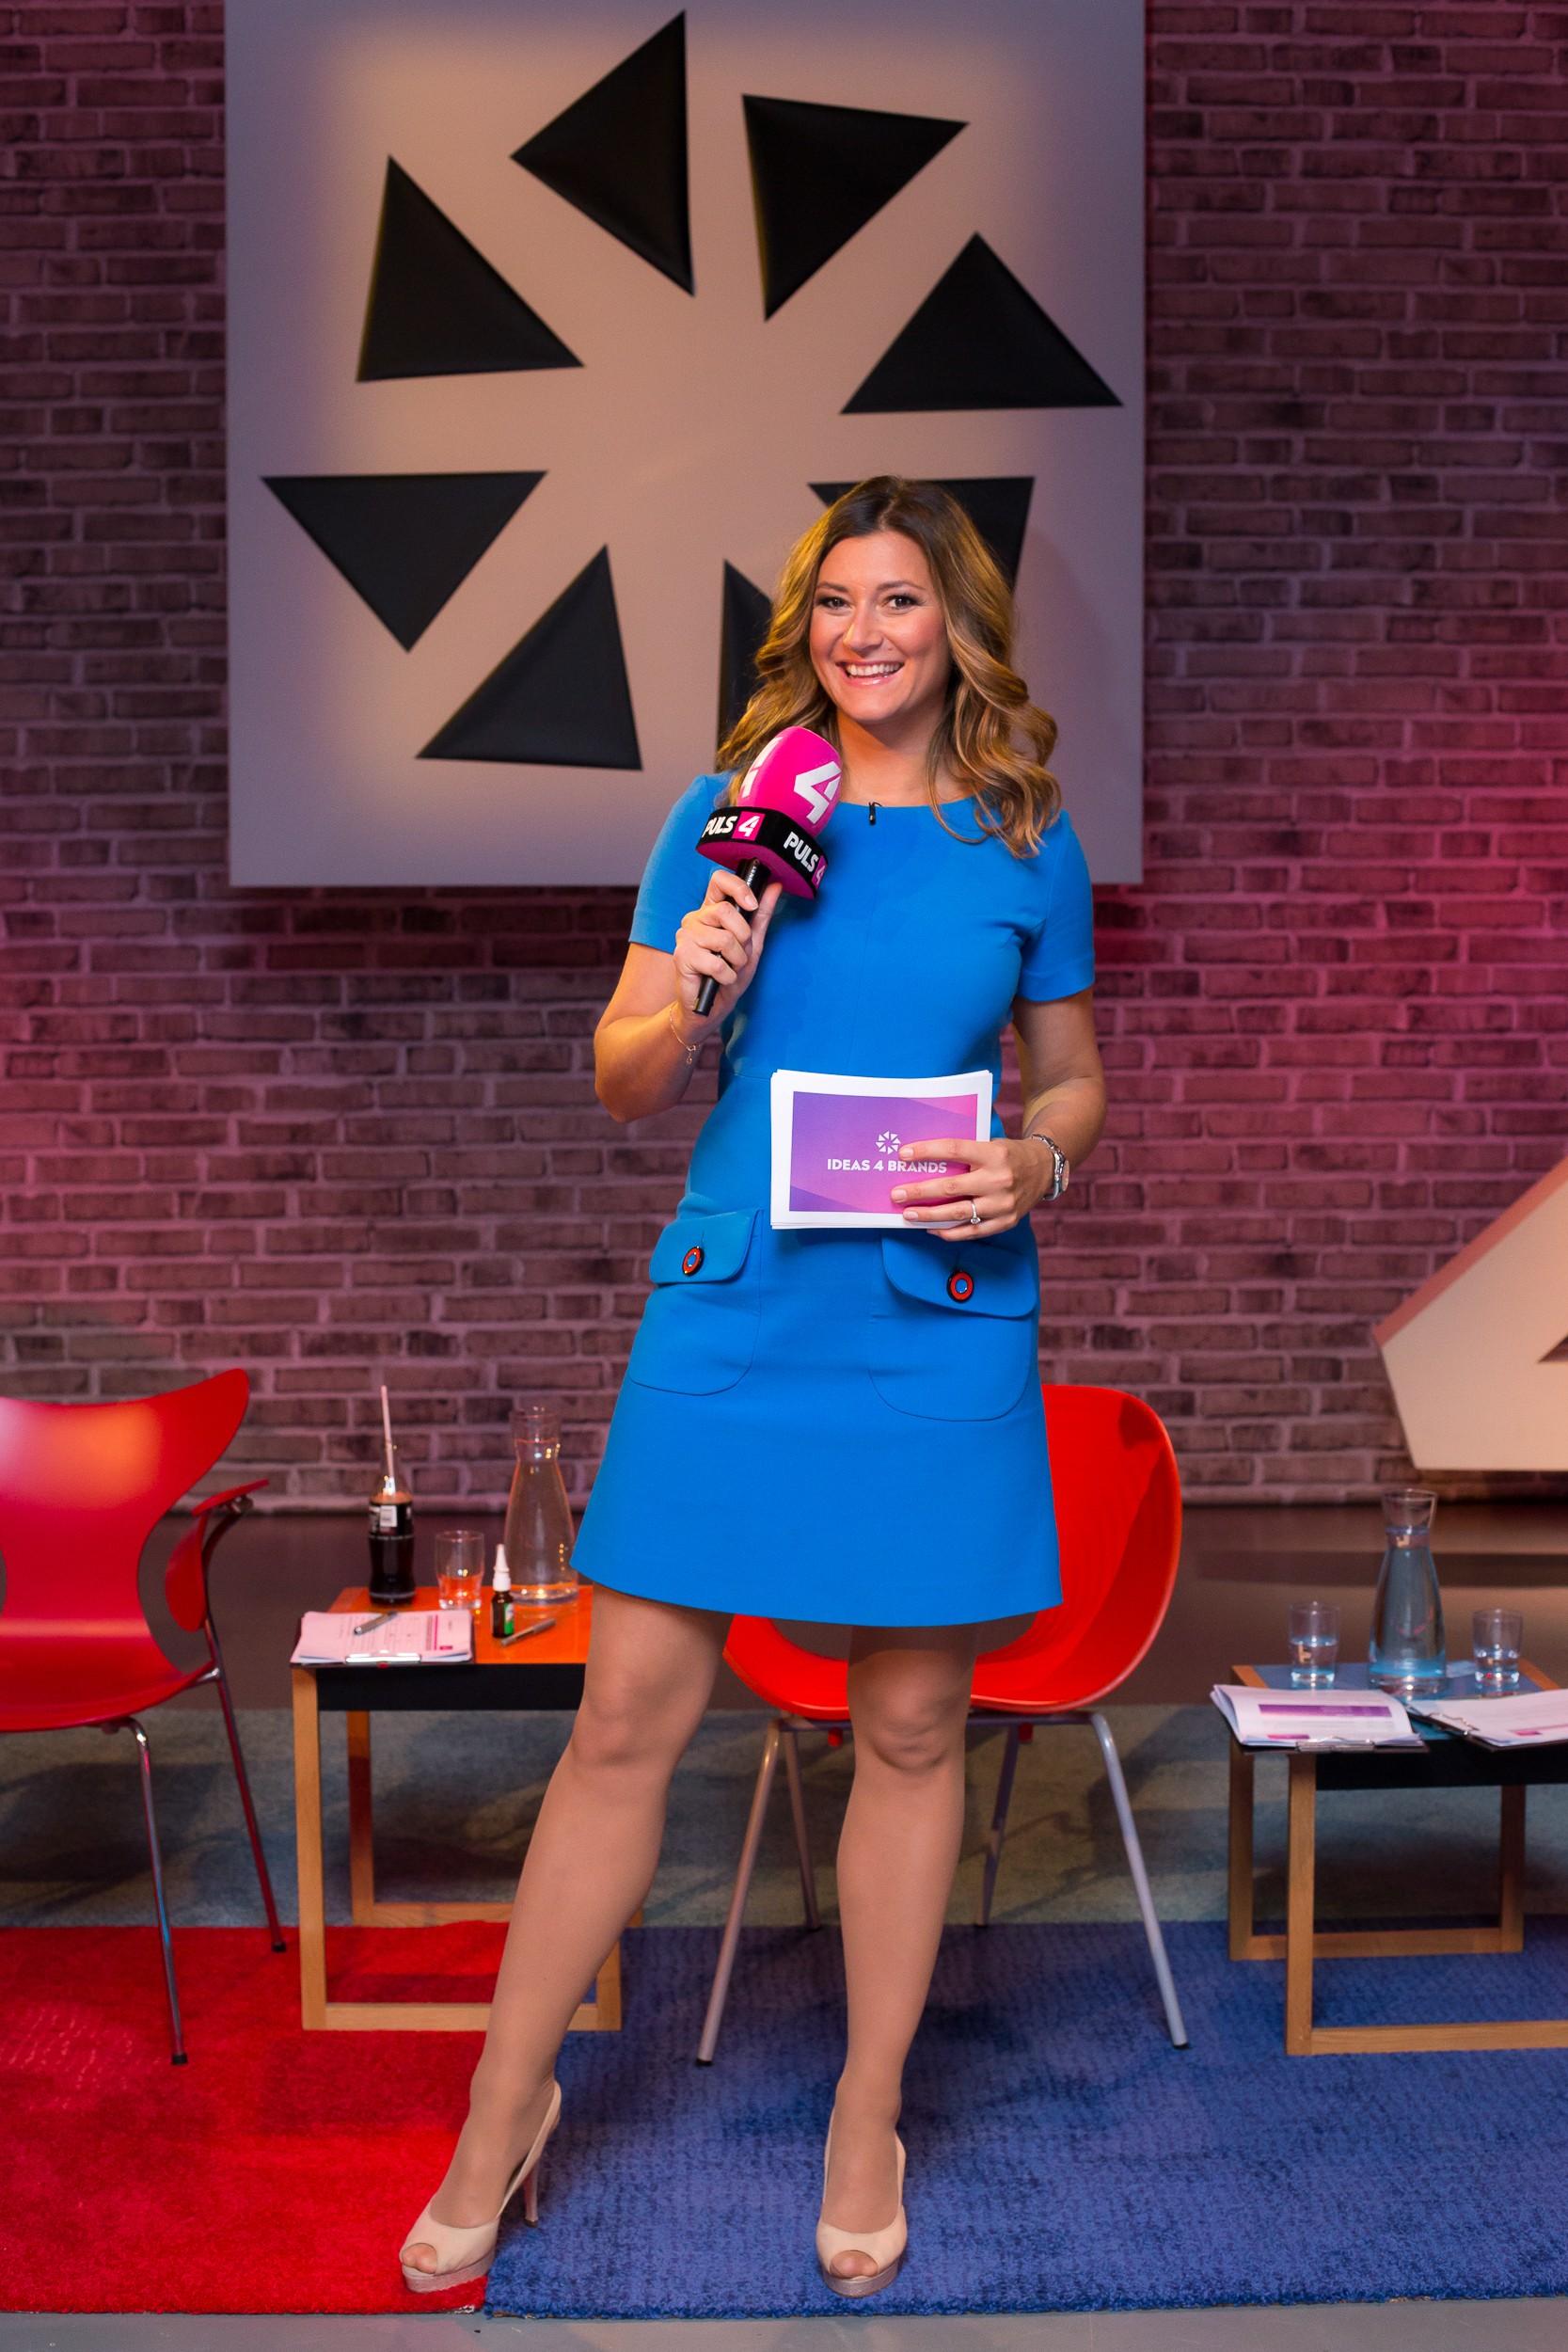 Ideas 4 Brands, Puls 4, Sandra Thier, Influencer, Coca Cola, Borotalco, Natusweet, OTTO